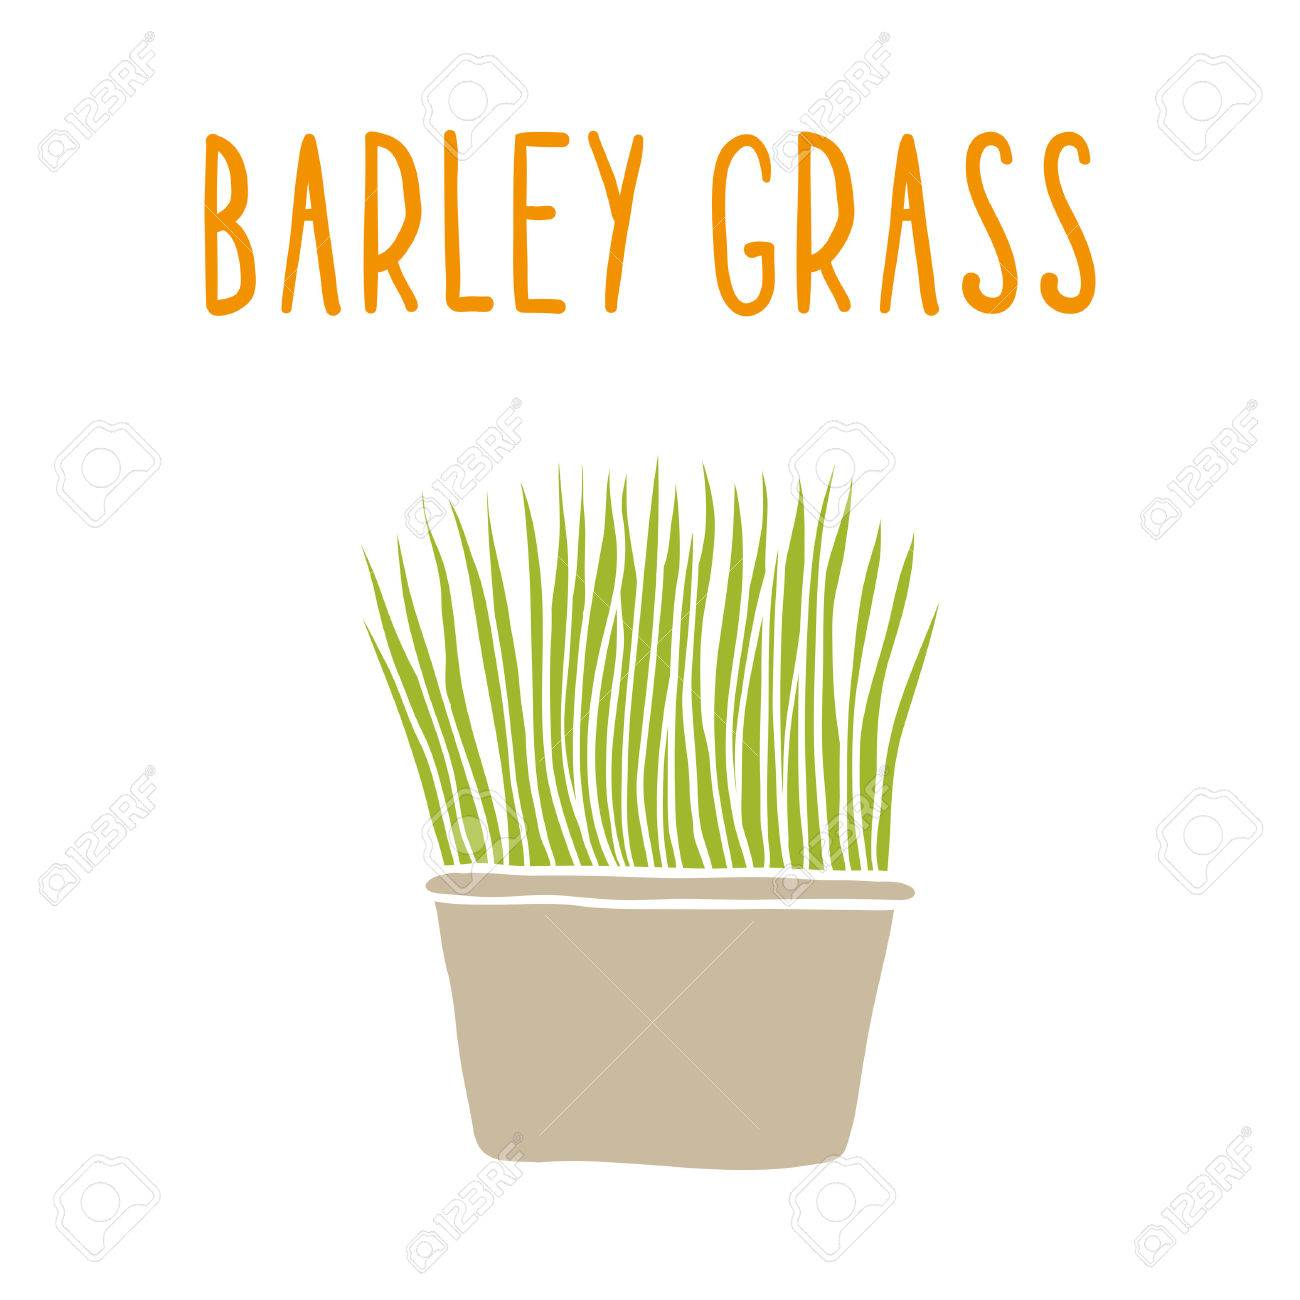 Barley grass. Vector hand drawn illustration. - 36967606